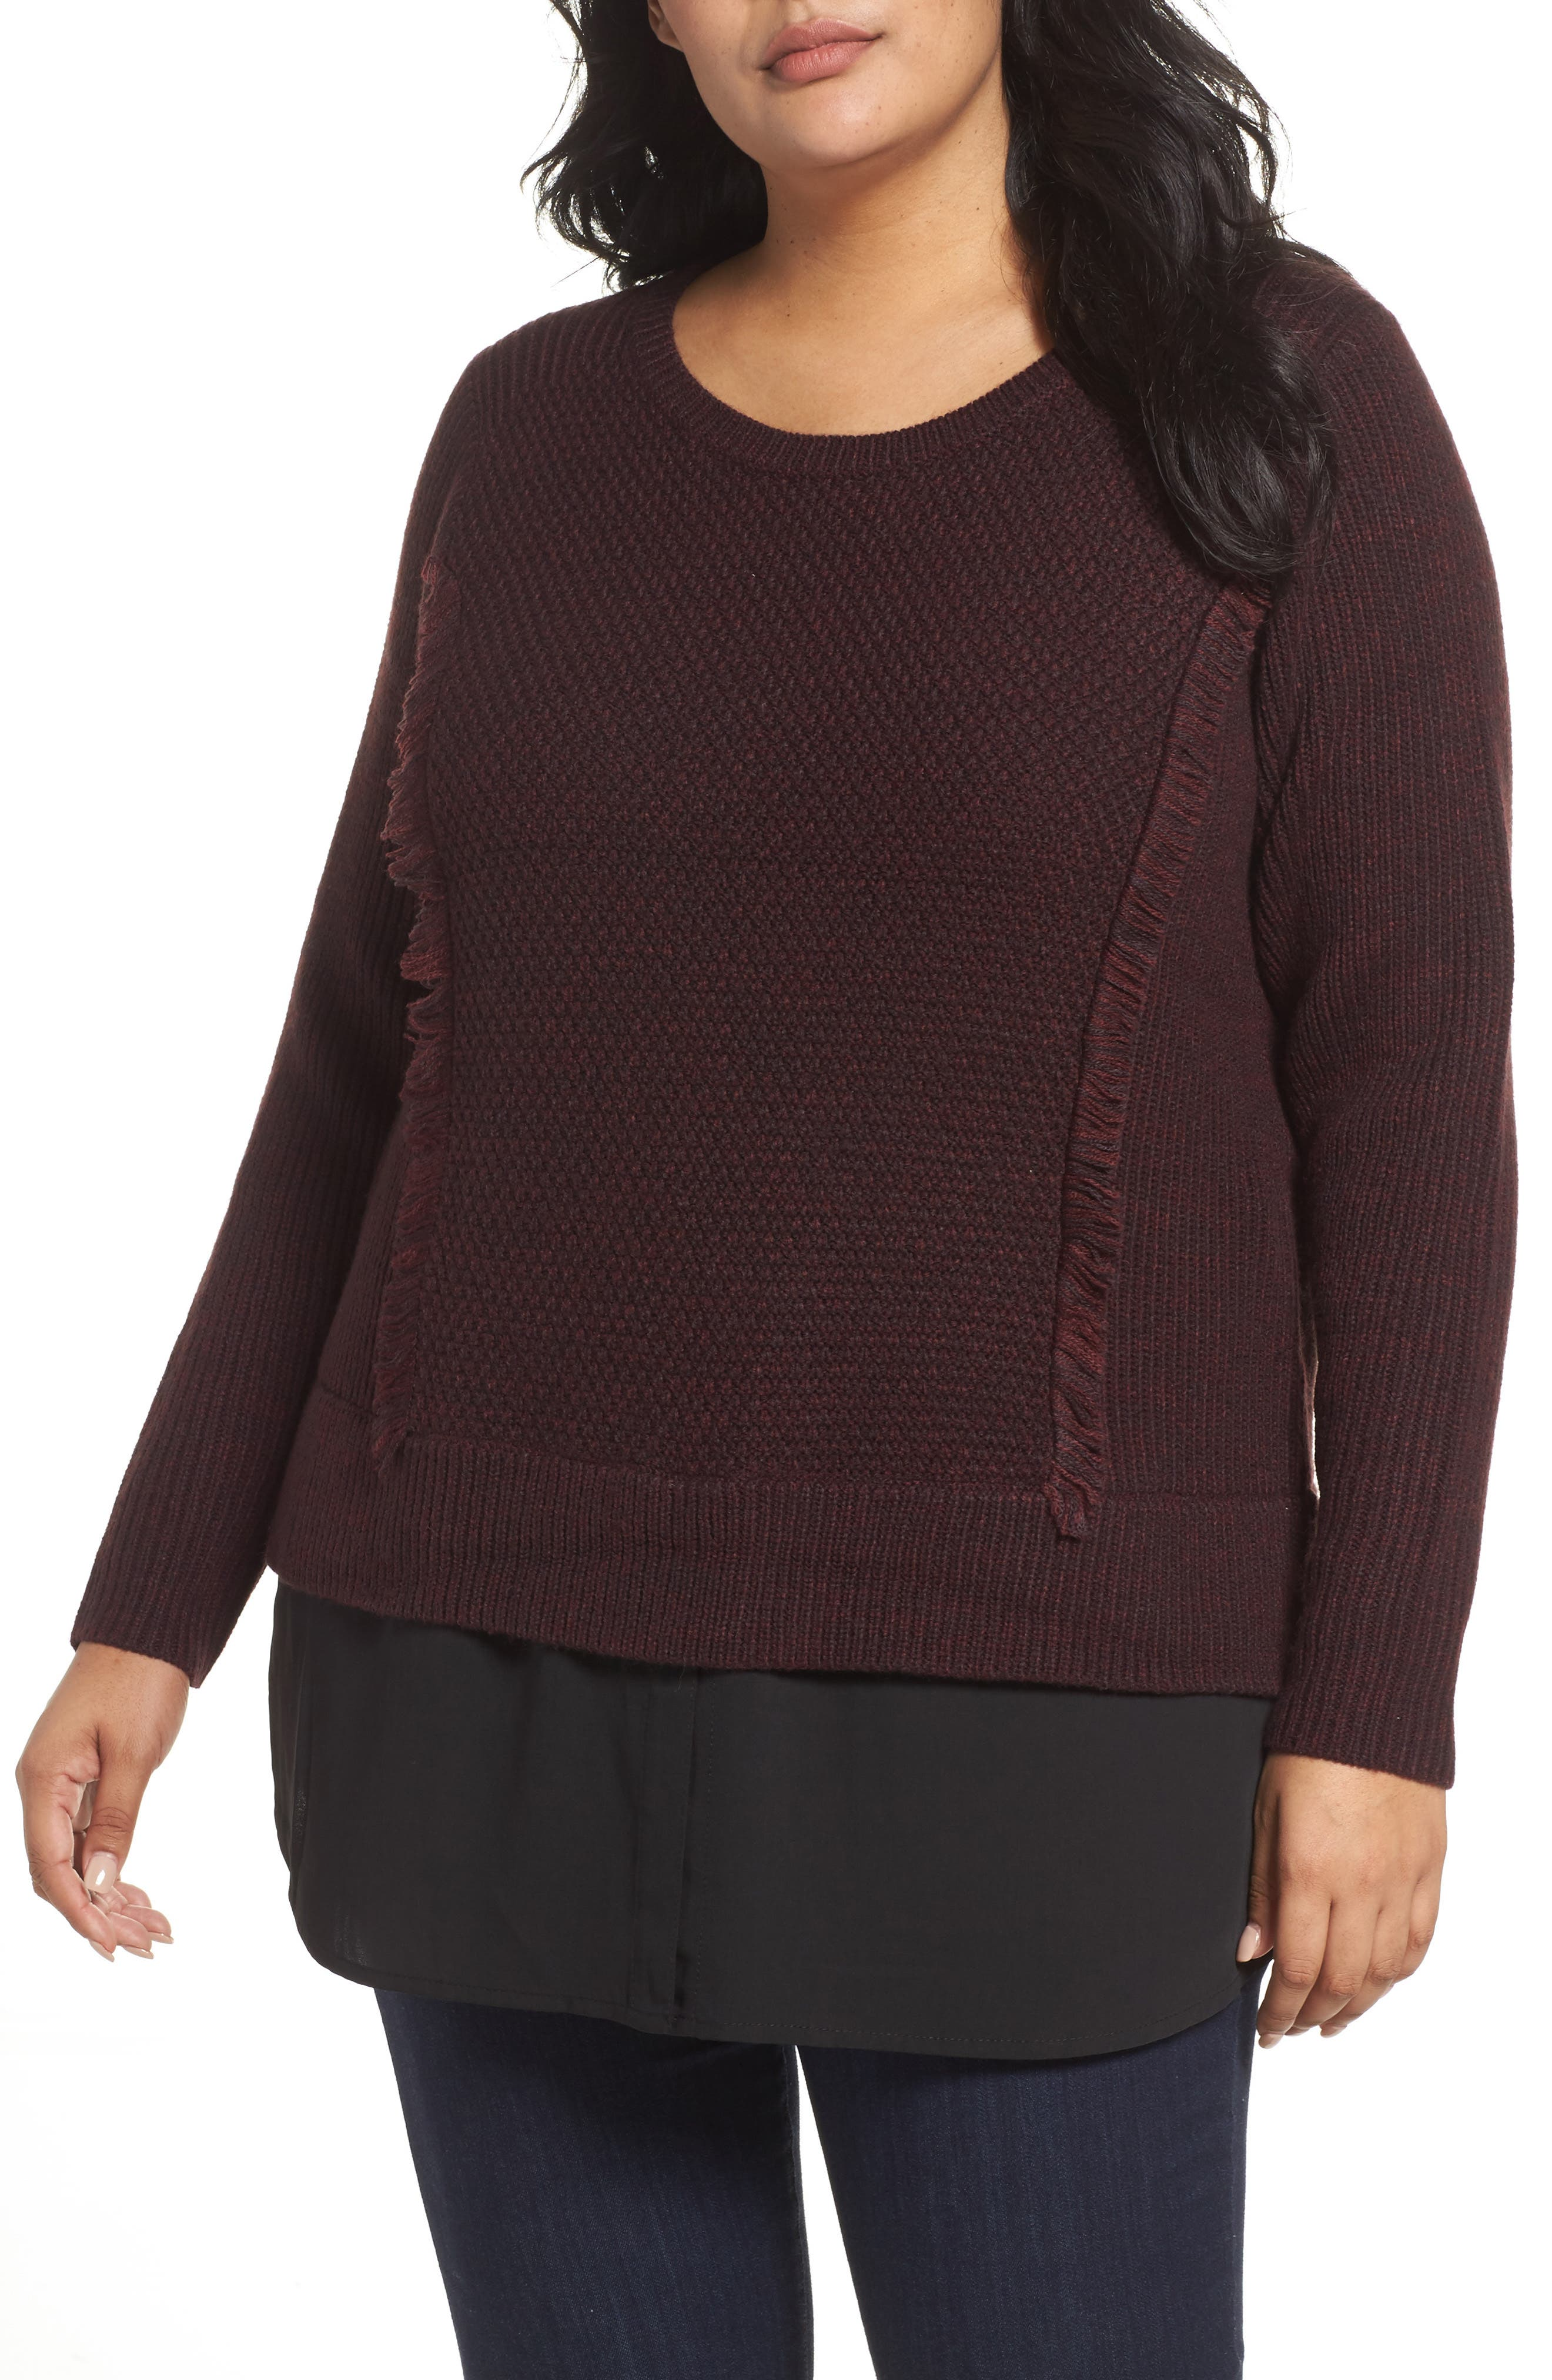 Foxcroft Sophia Layered Look Sweater (Plus Size)